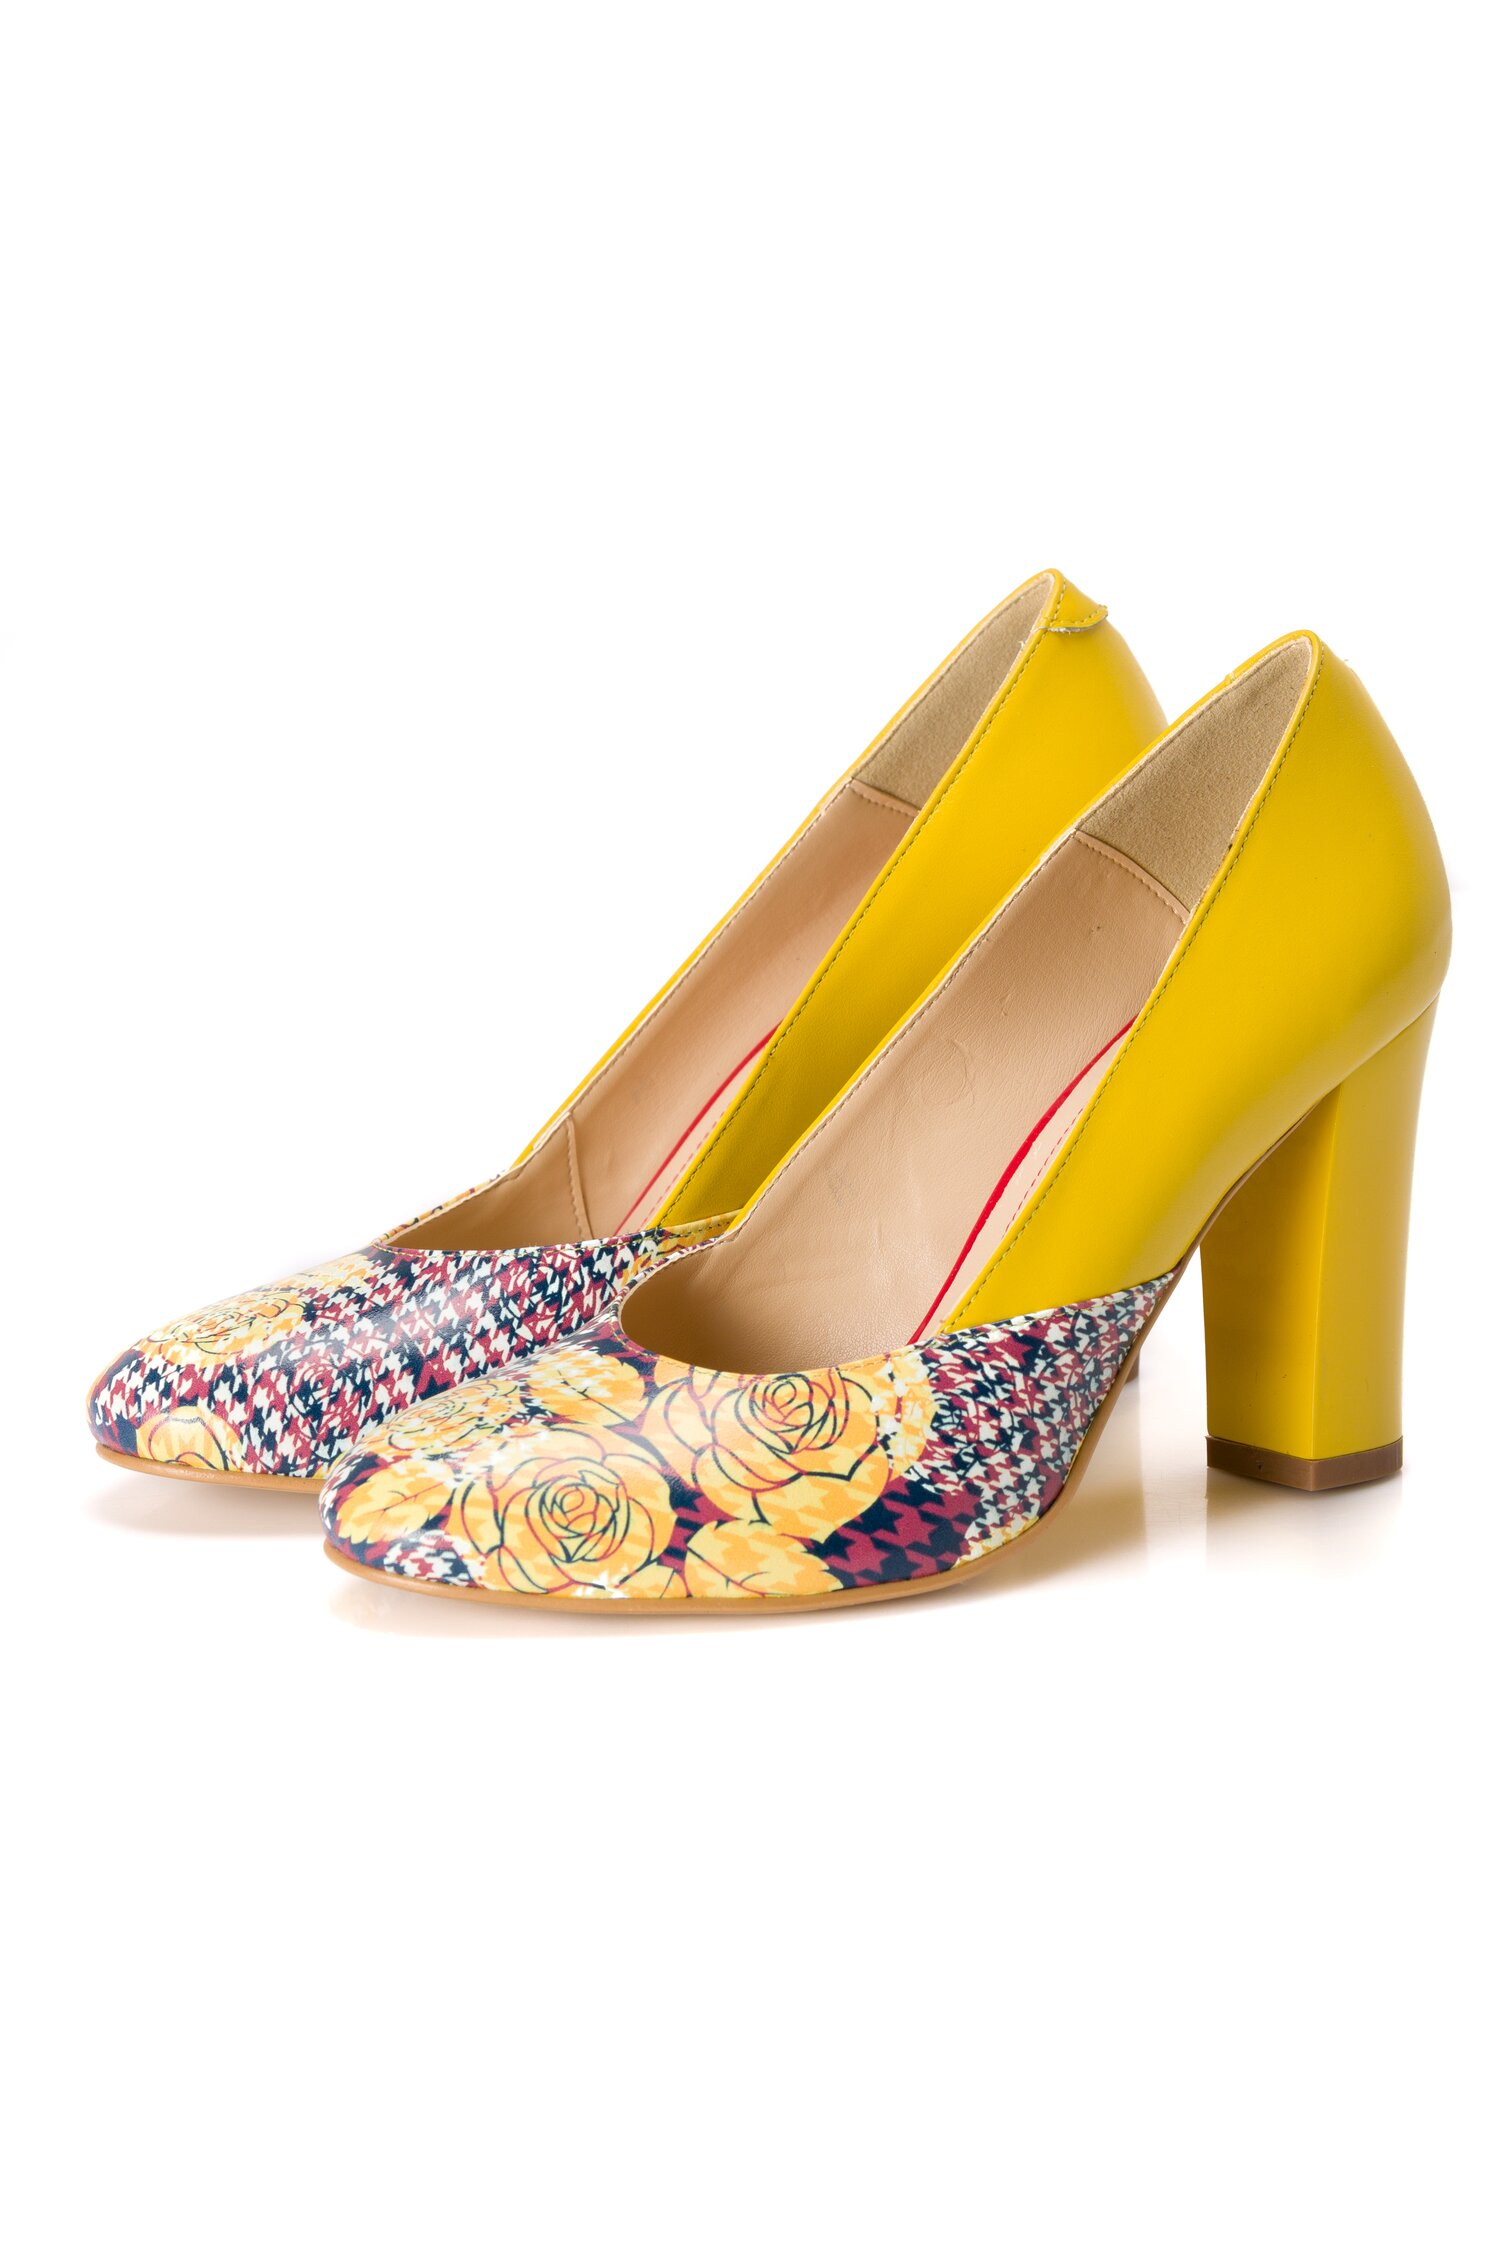 Pantofi galben cu imprimeu floral pe varf si toc lacuit imagine